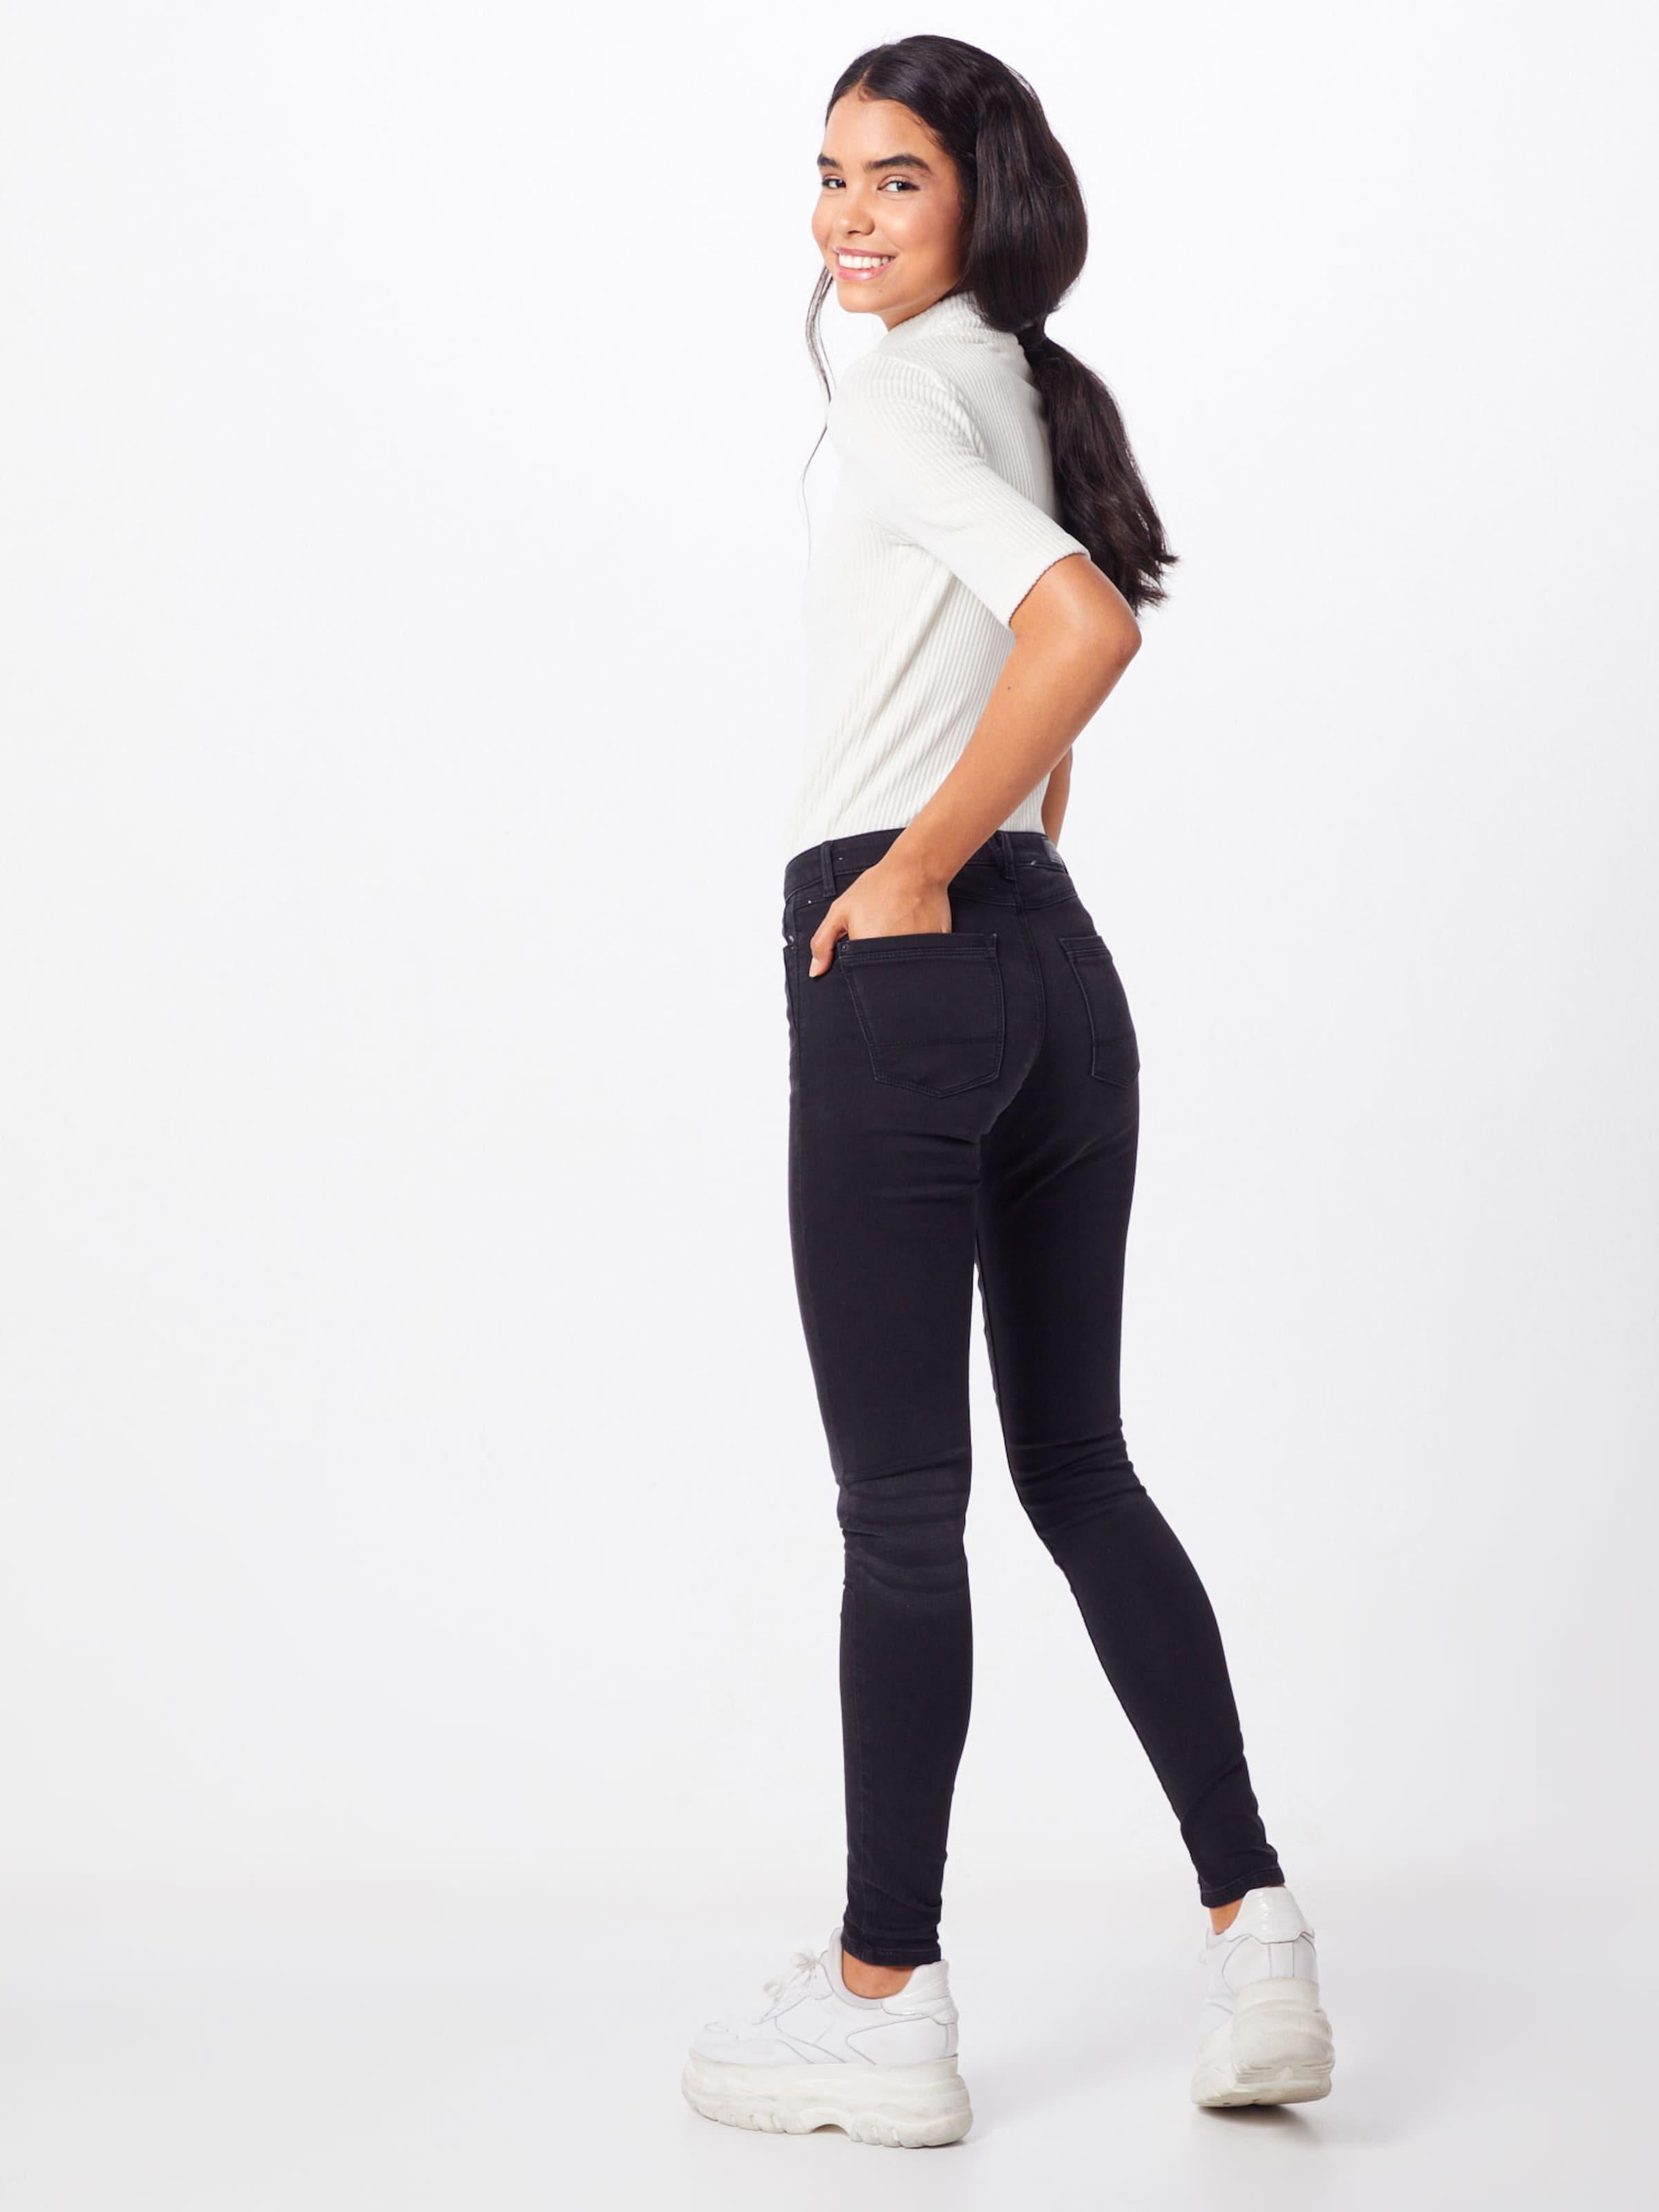 'ocs In Denim Jeans Skinny' Black Esprit Mr htQCBsrodx